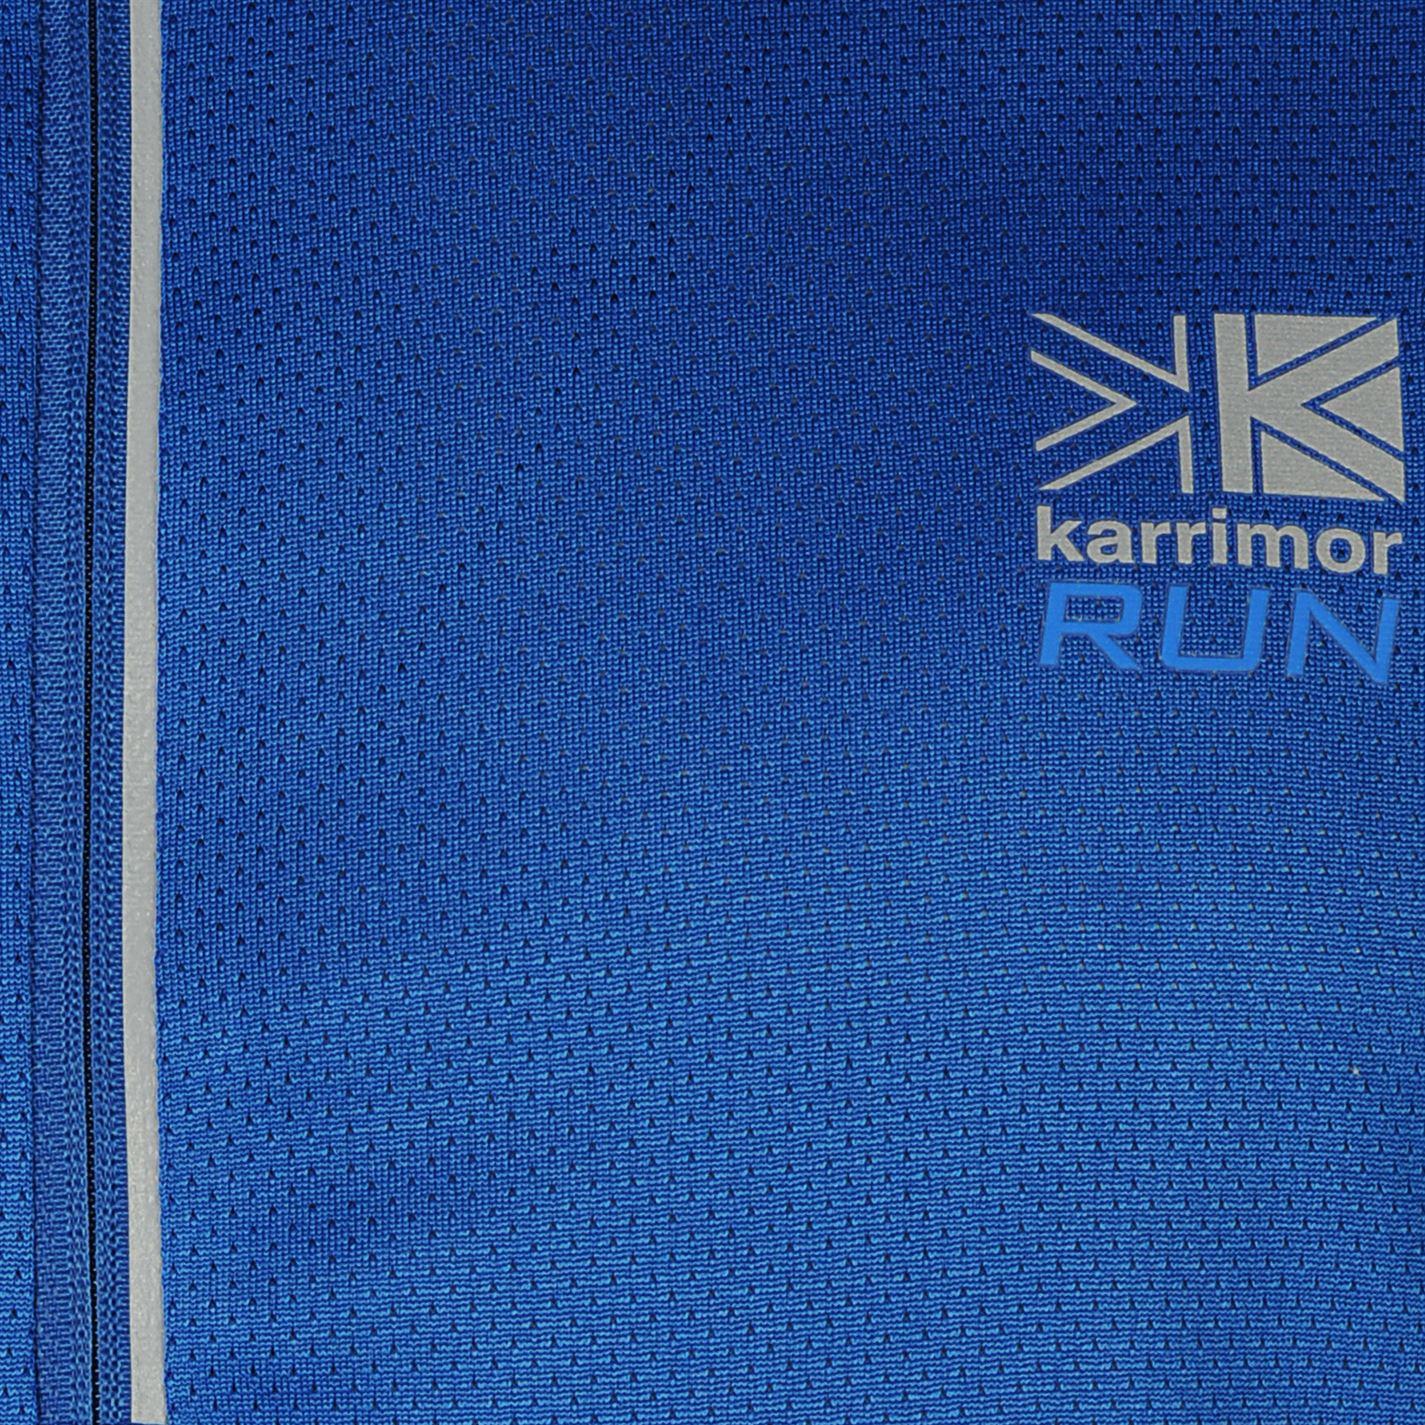 Karrimor-Correr-Mens-X-Cremallera-Camiseta-Camiseta-Top-Transpirable-Ligero-Mentonera miniatura 16